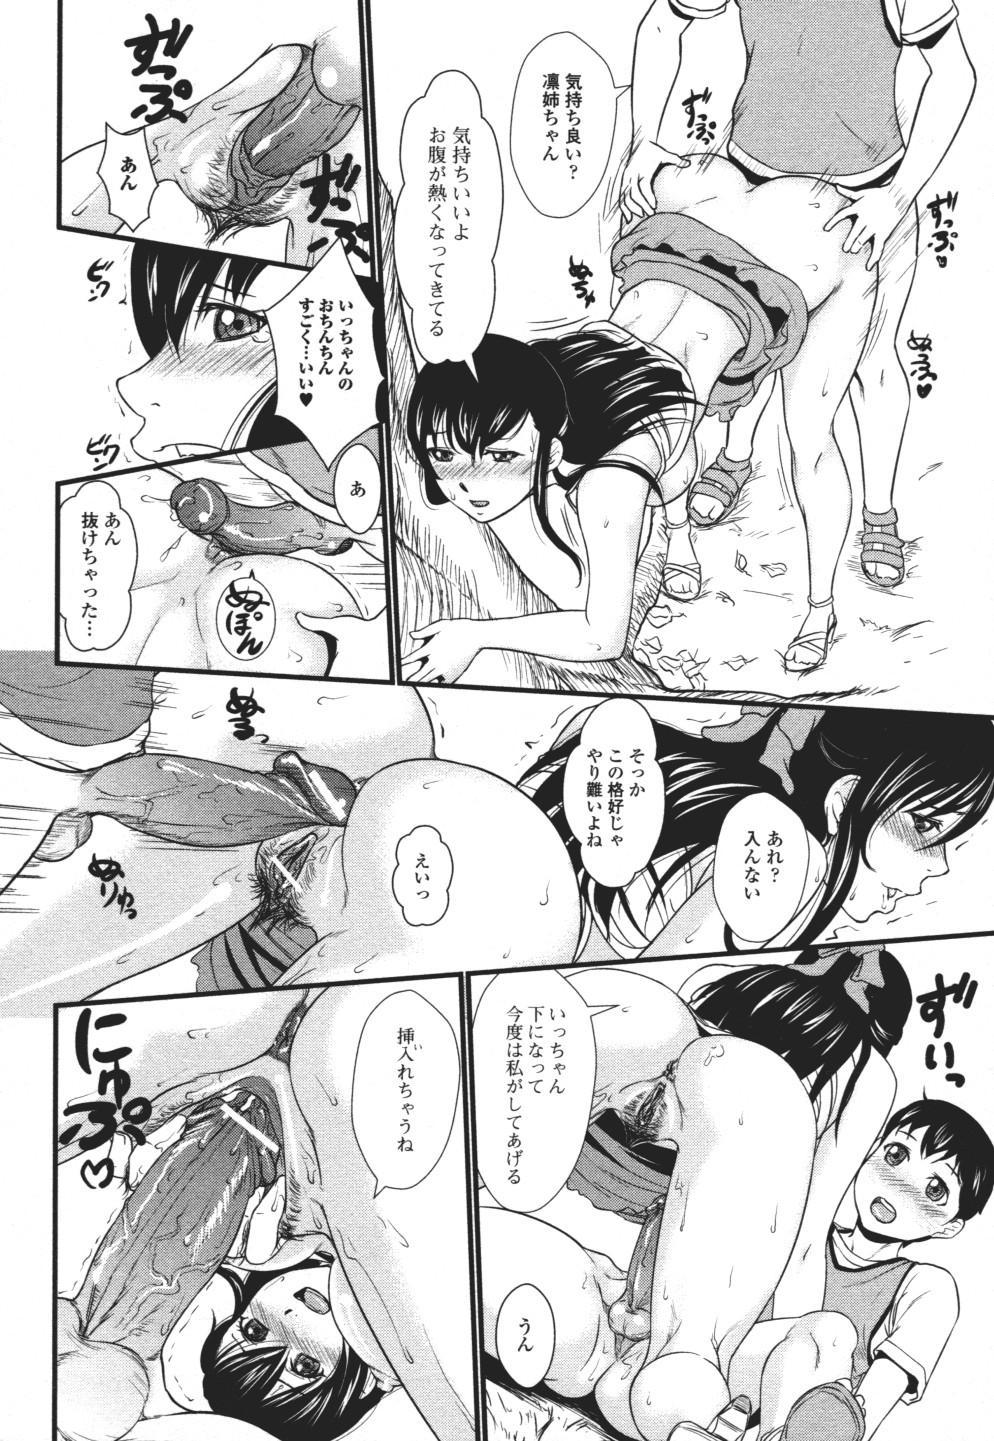 Nozoite wa Ikenai 3 - Do Not Peep! 3 112